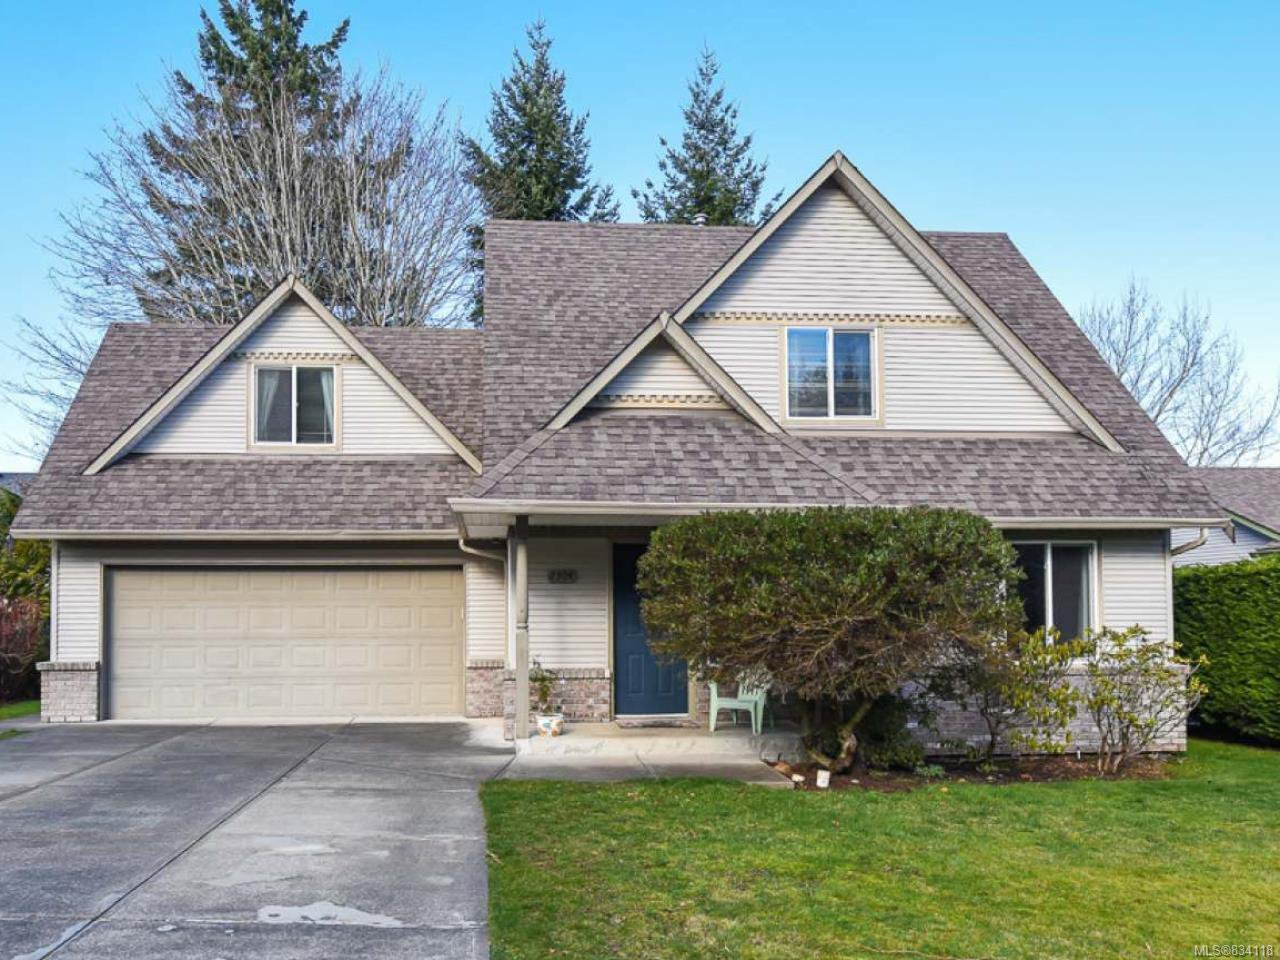 Main Photo: 2304 Heron Cres in COMOX: CV Comox (Town of) House for sale (Comox Valley)  : MLS®# 834118